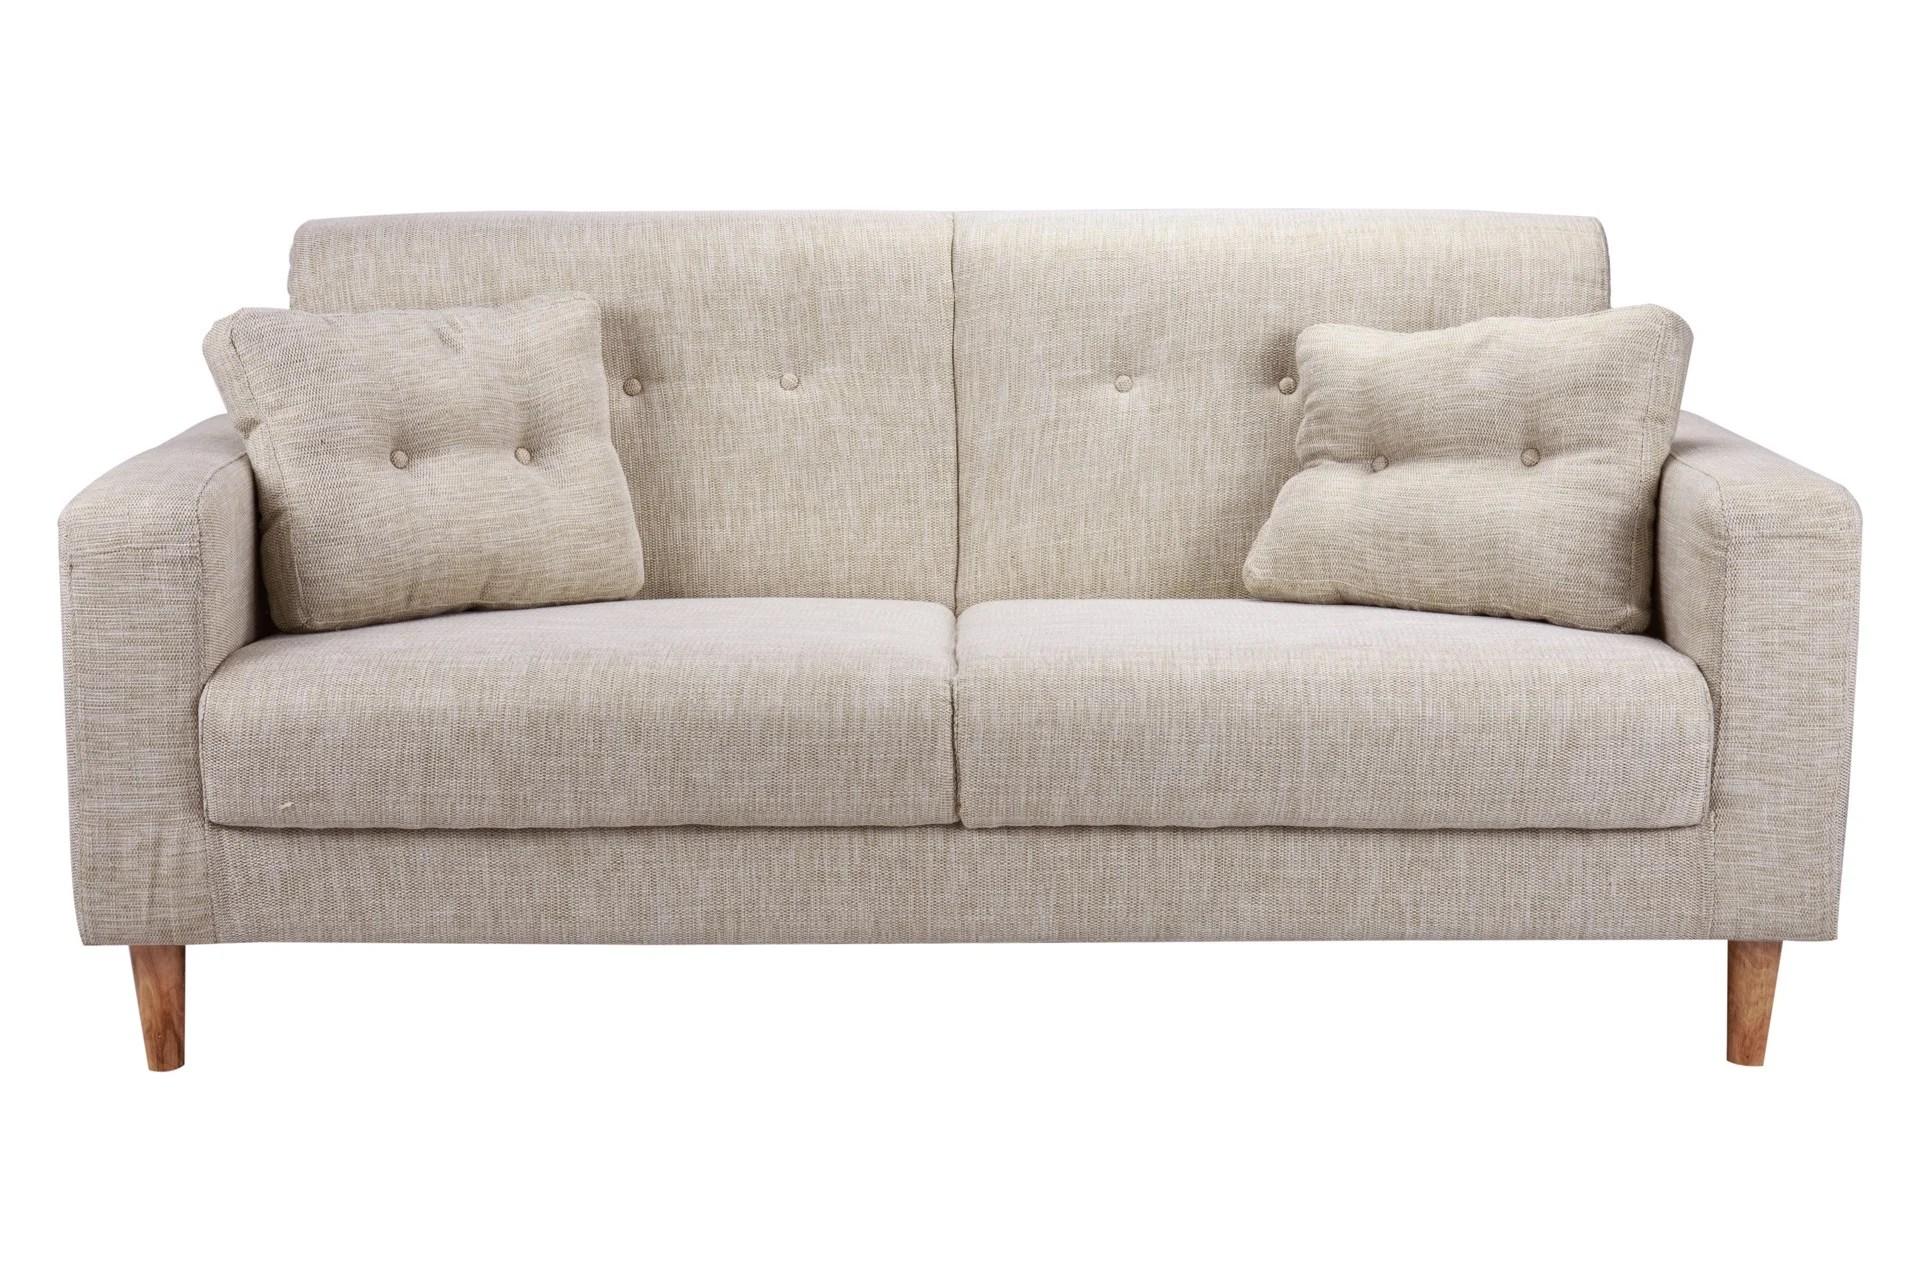 moods 3 seater leather sofa bed velvet dark grey lars  chuyên cung cấp đồ nội thất cao